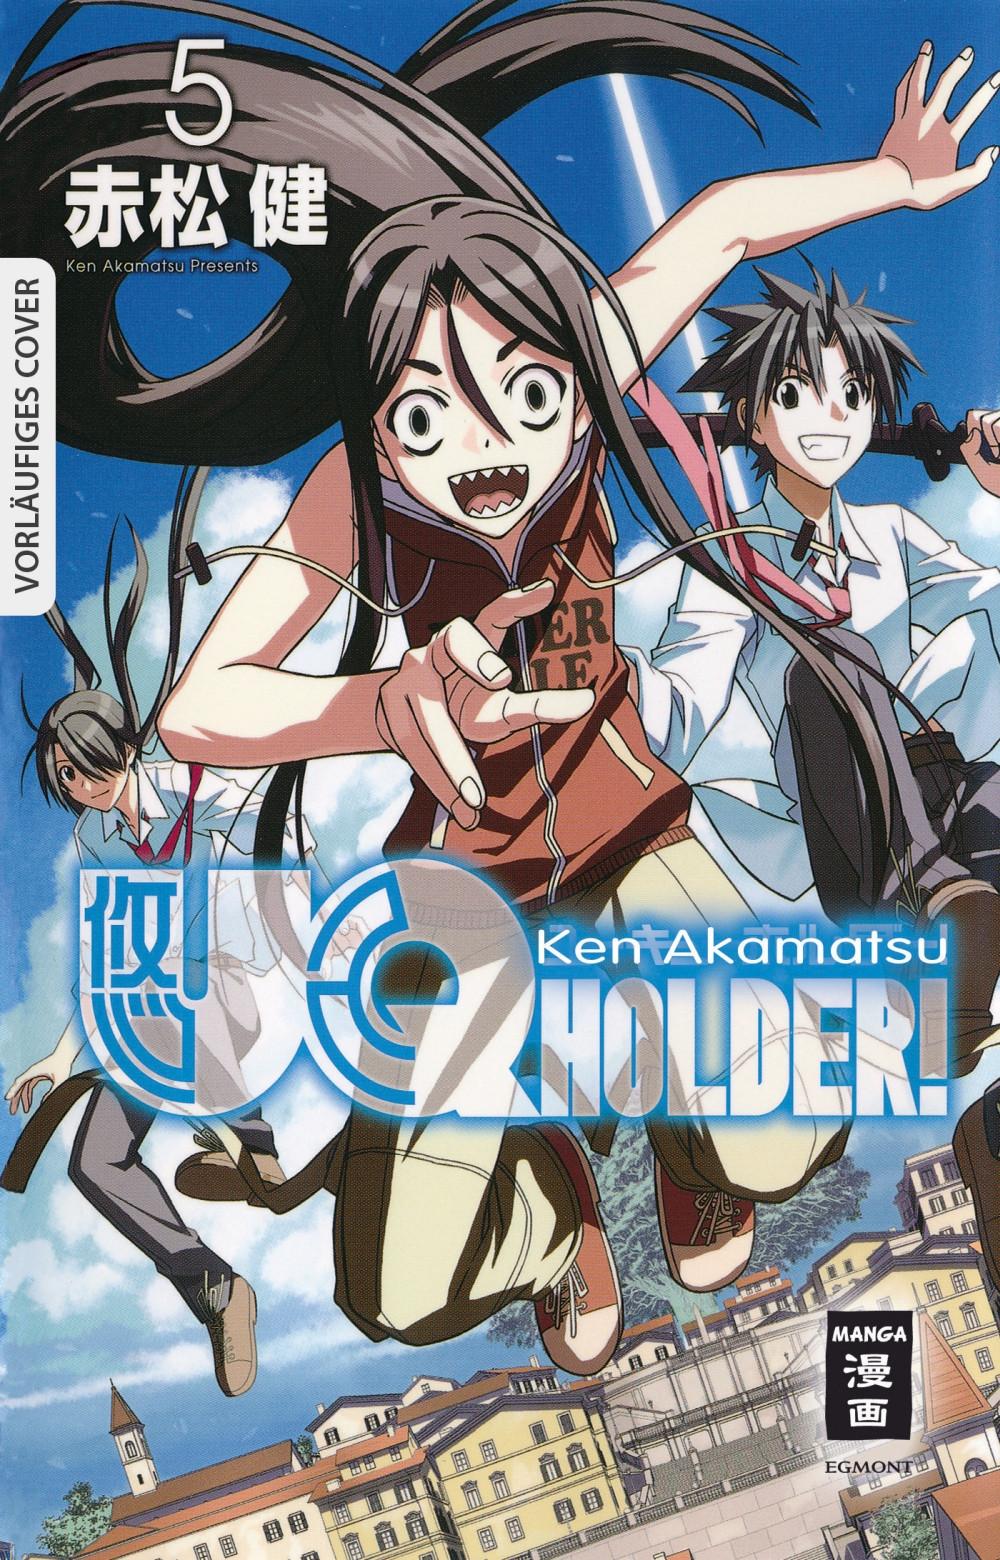 Uq Holder 5 Manga